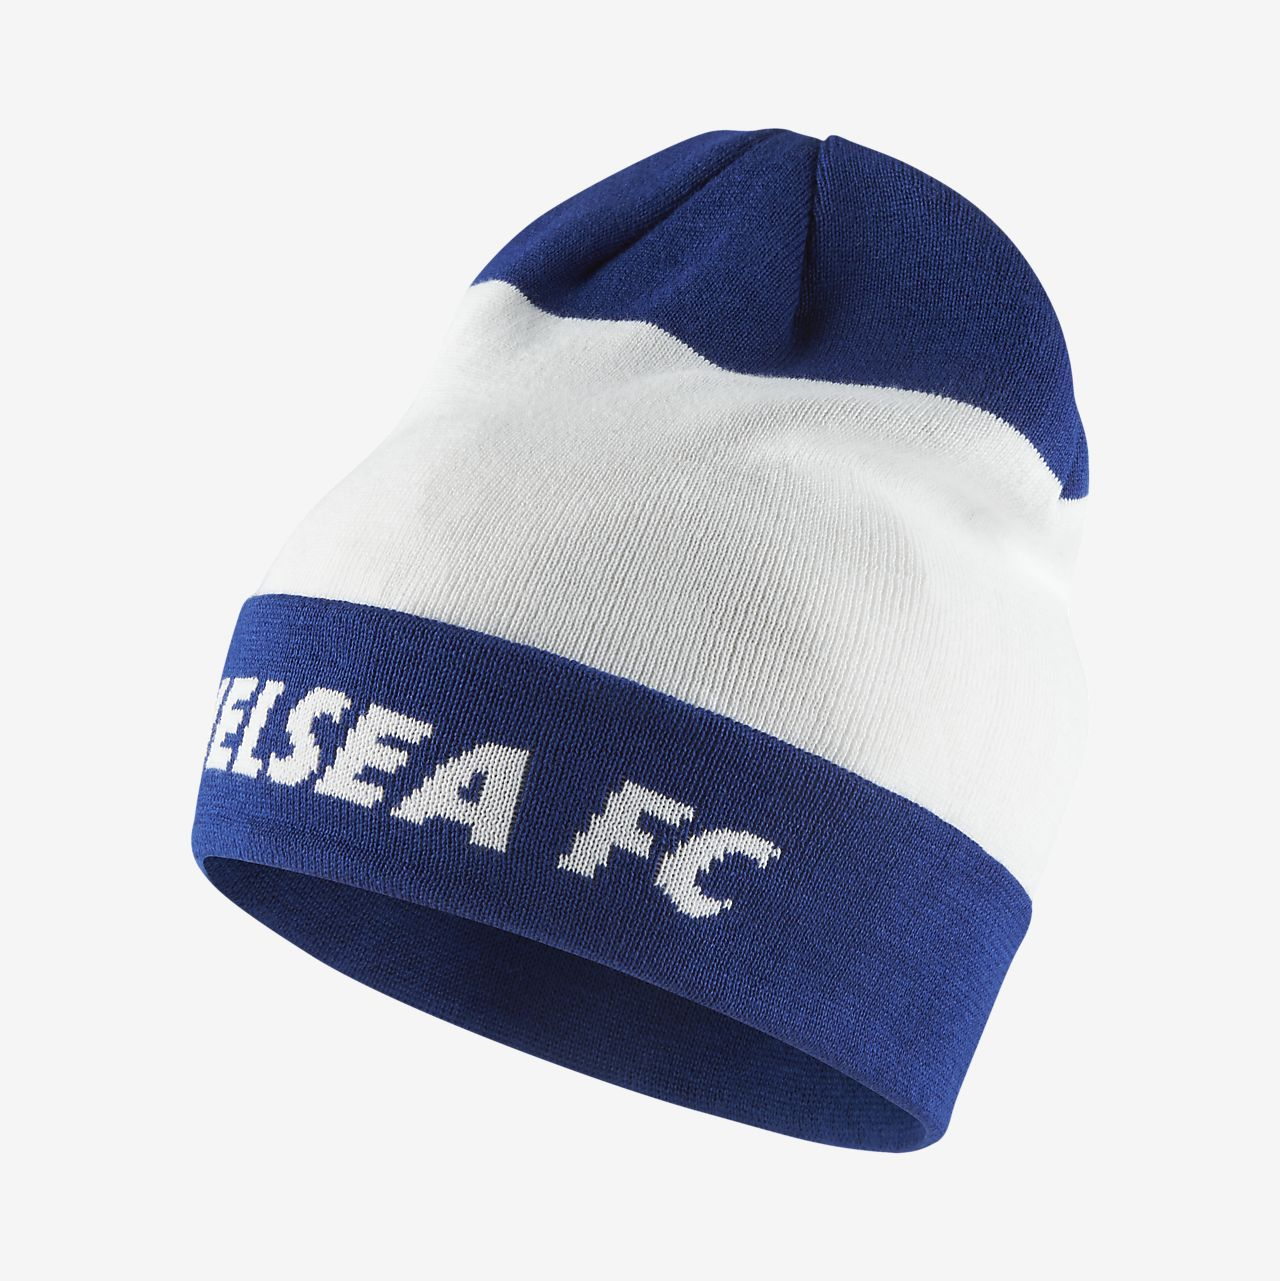 7f7a99f706e Chelsea FC Beanie. Nike.com GB